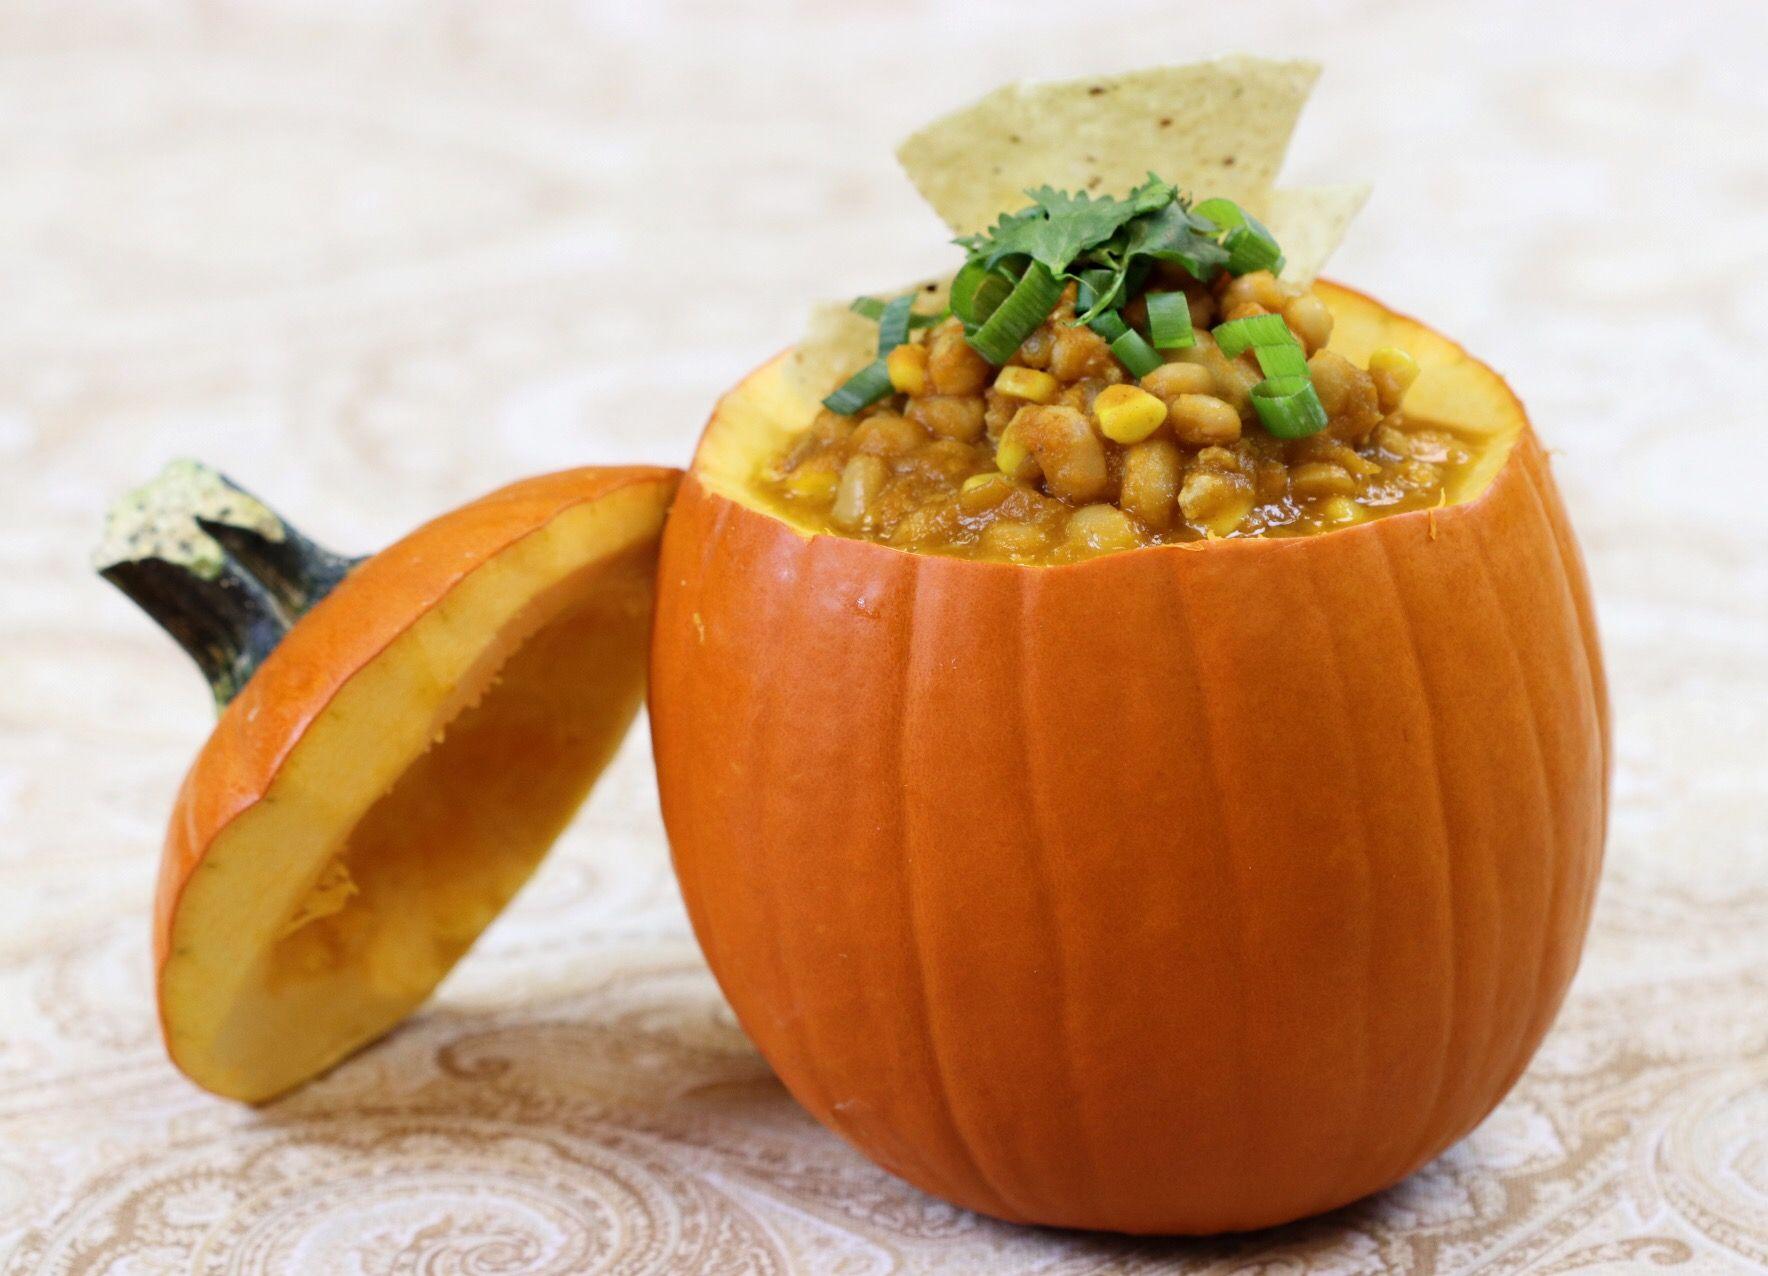 Make Ahead Turkey, Pumpkin and White Bean Chili - Forkly